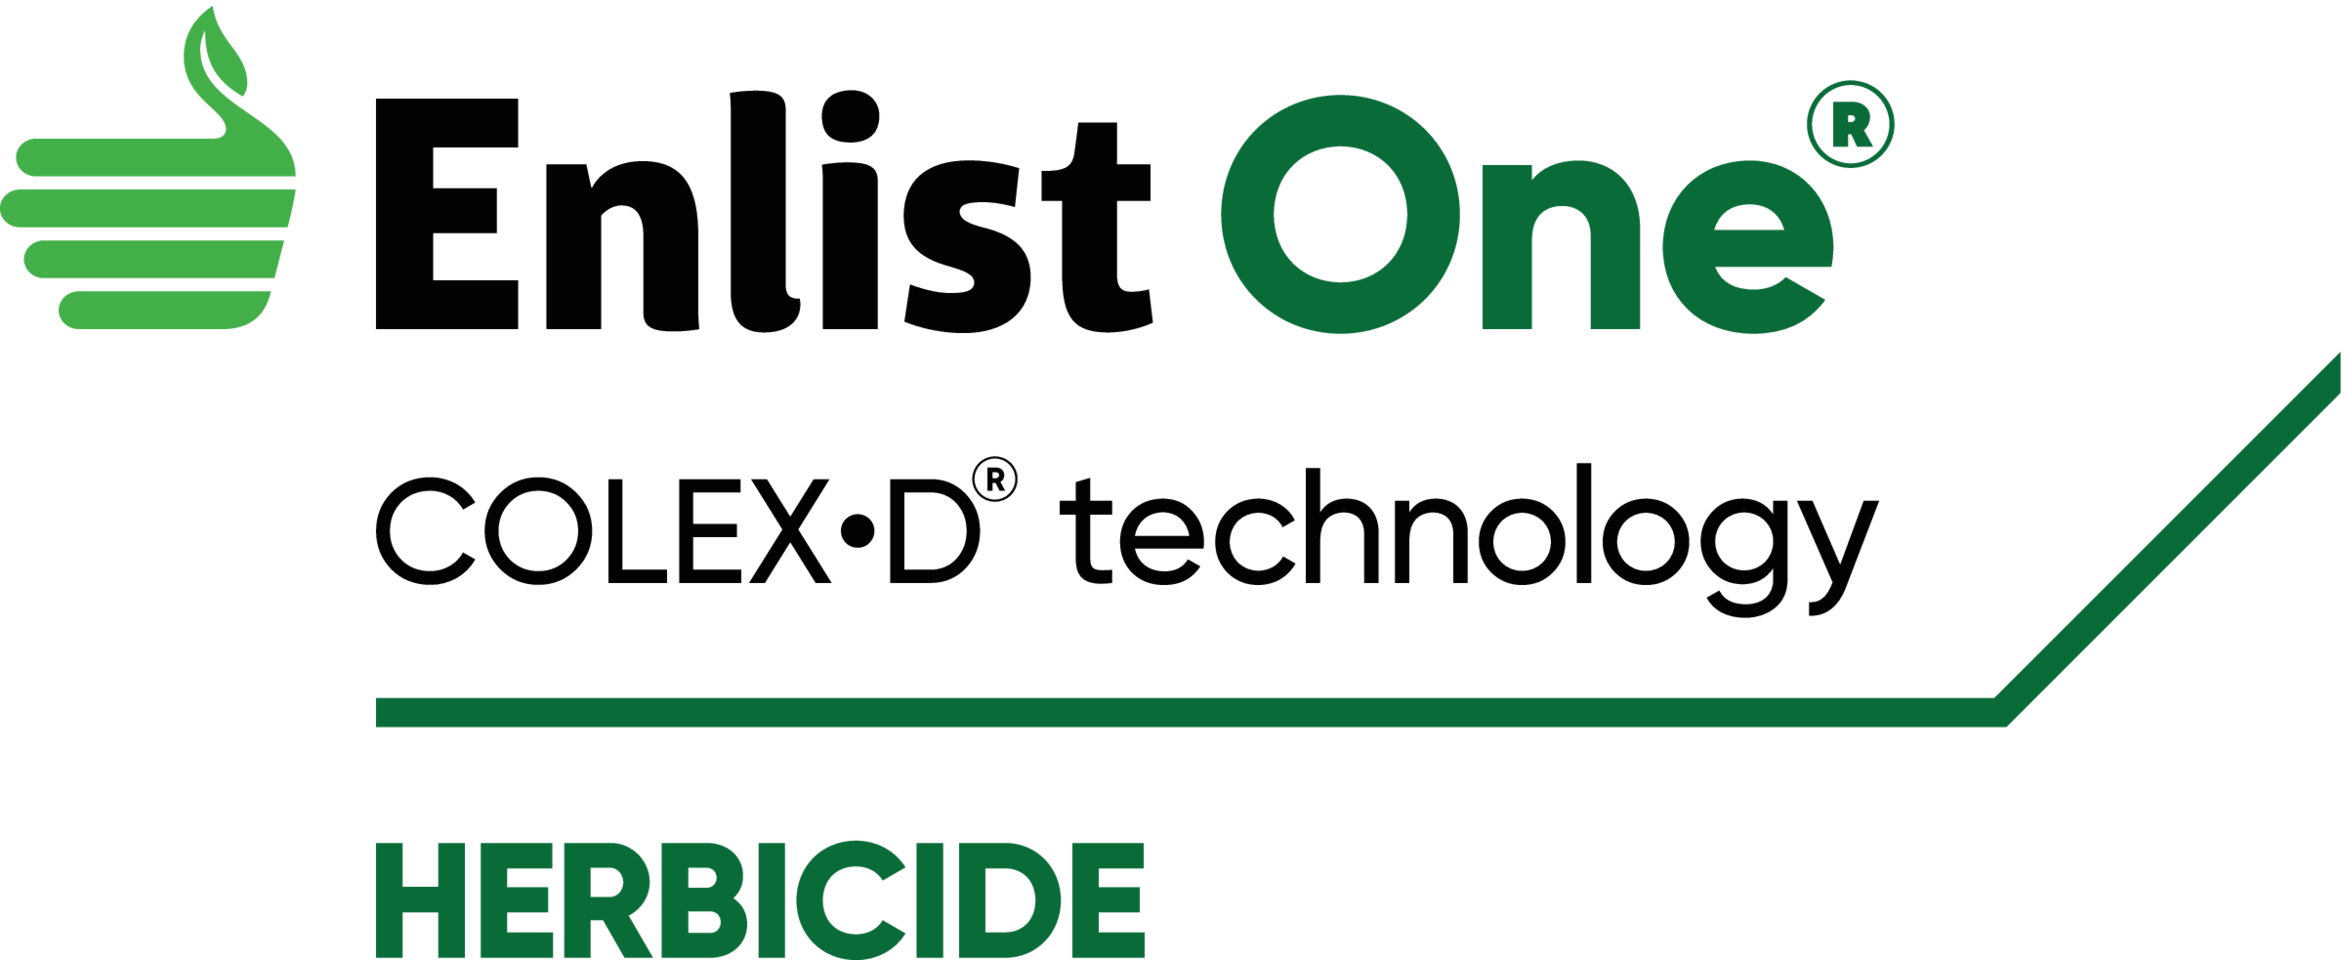 enlist one colexd logo